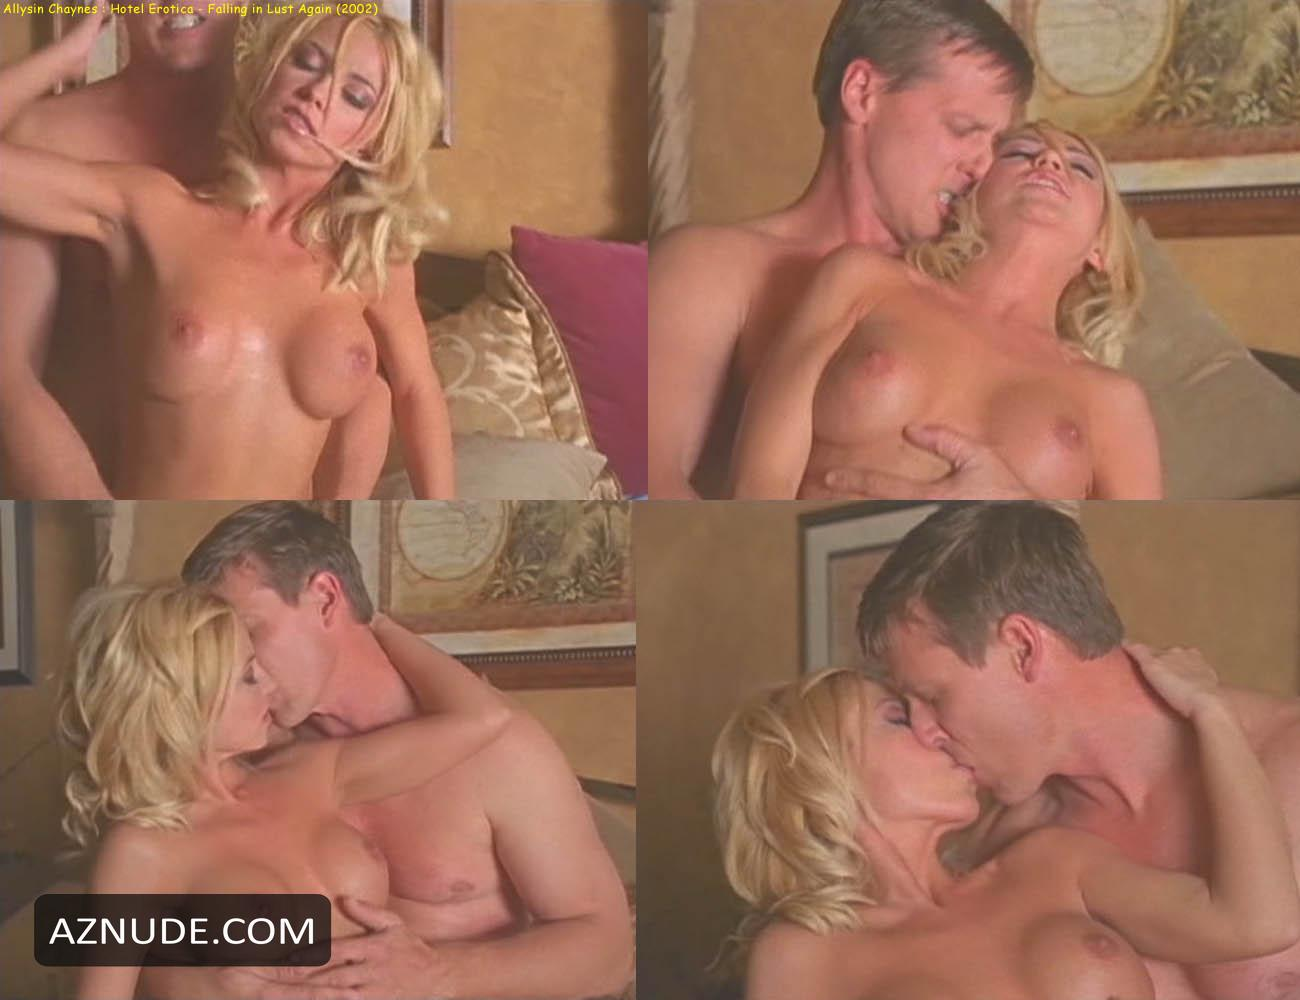 paradise hotel sex scener vi menn piken 2005